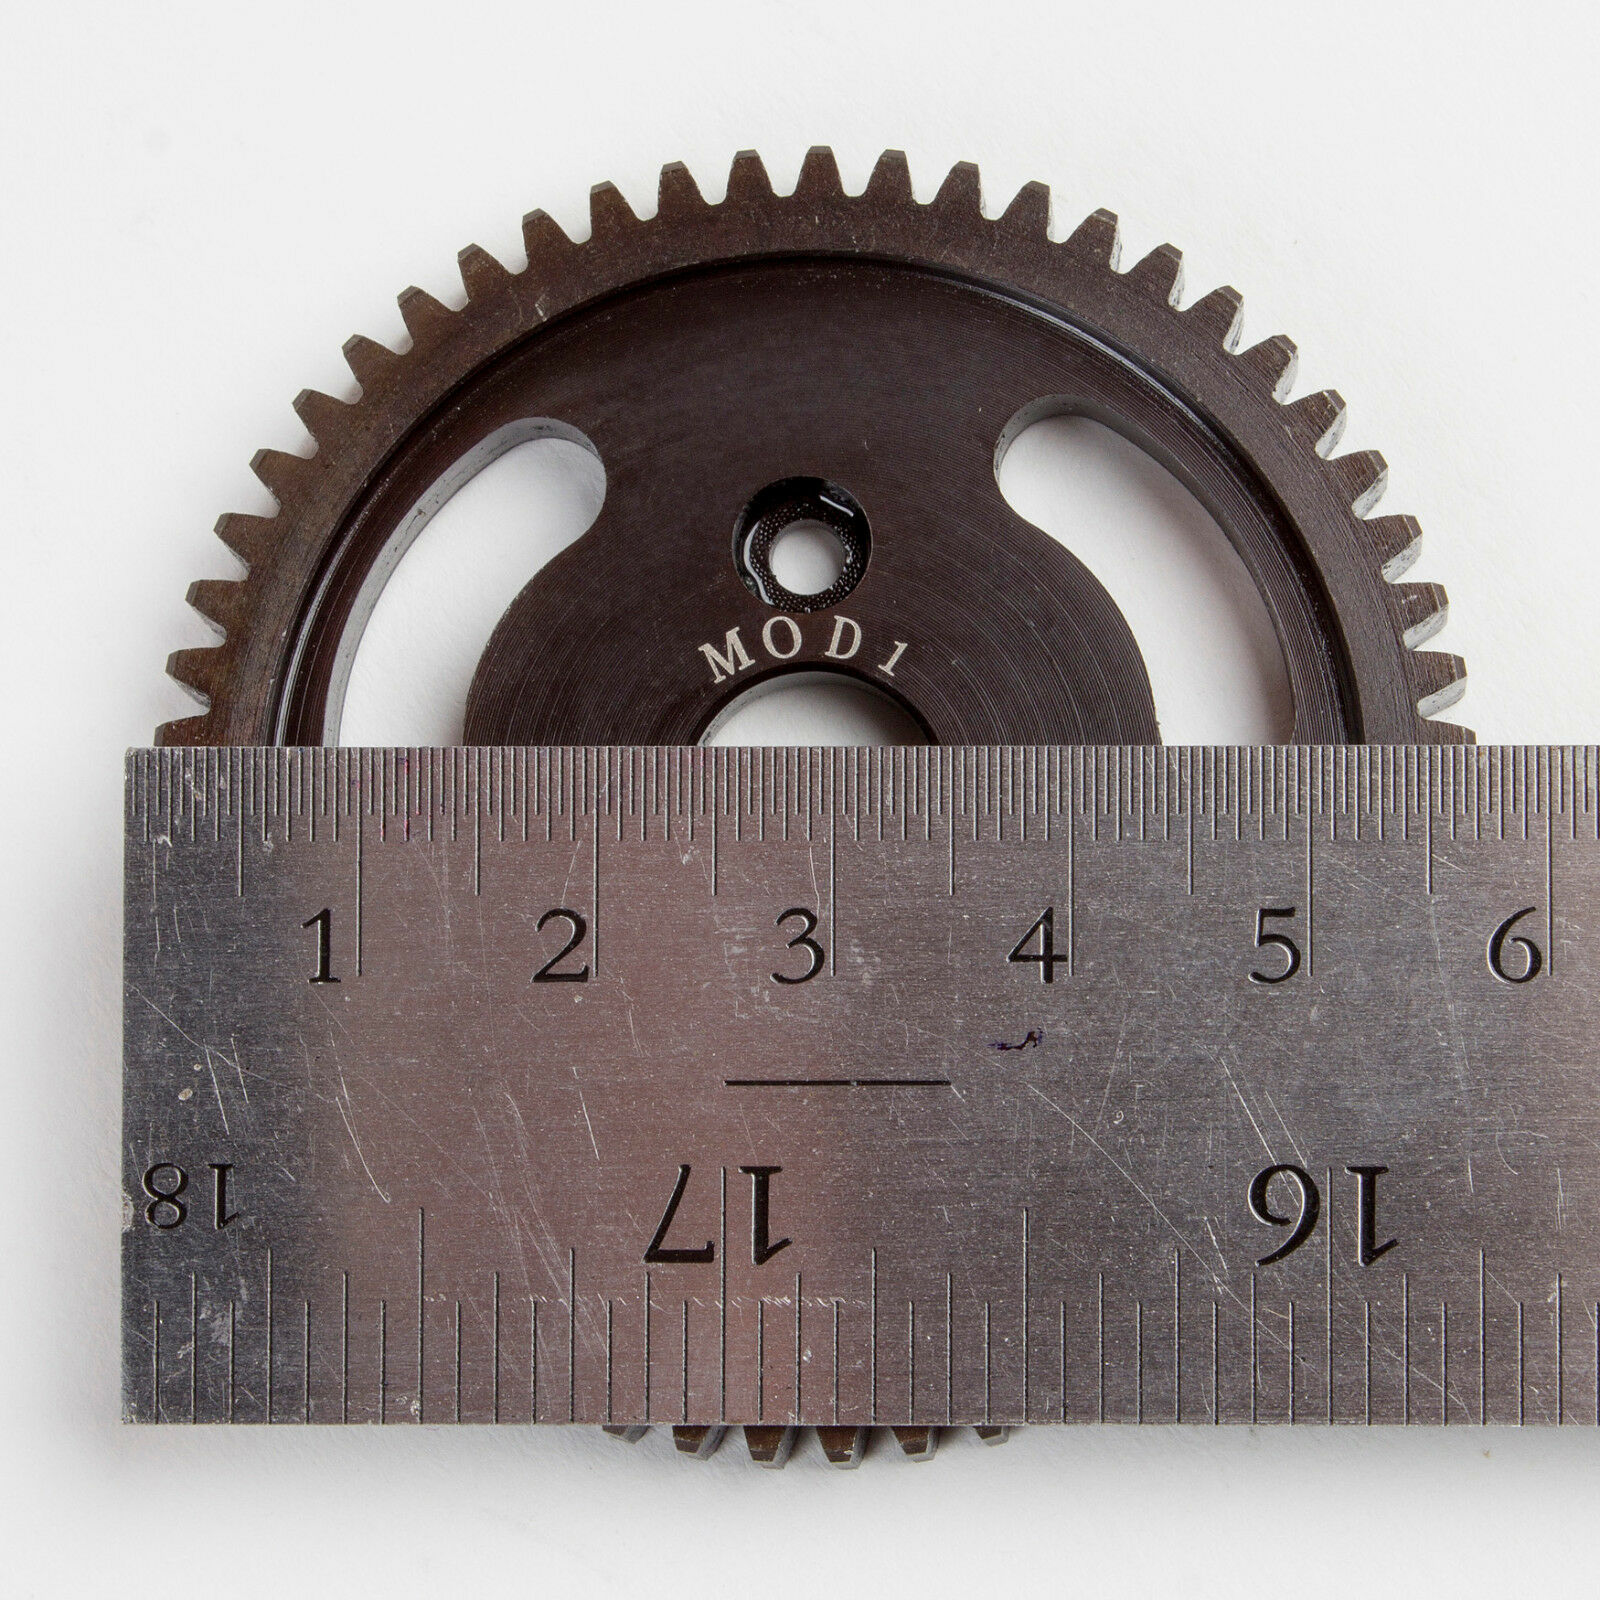 55T 55T 55T Mod1 Hardened Steel Spur Gear Quantity=1 PC 9a2e4d